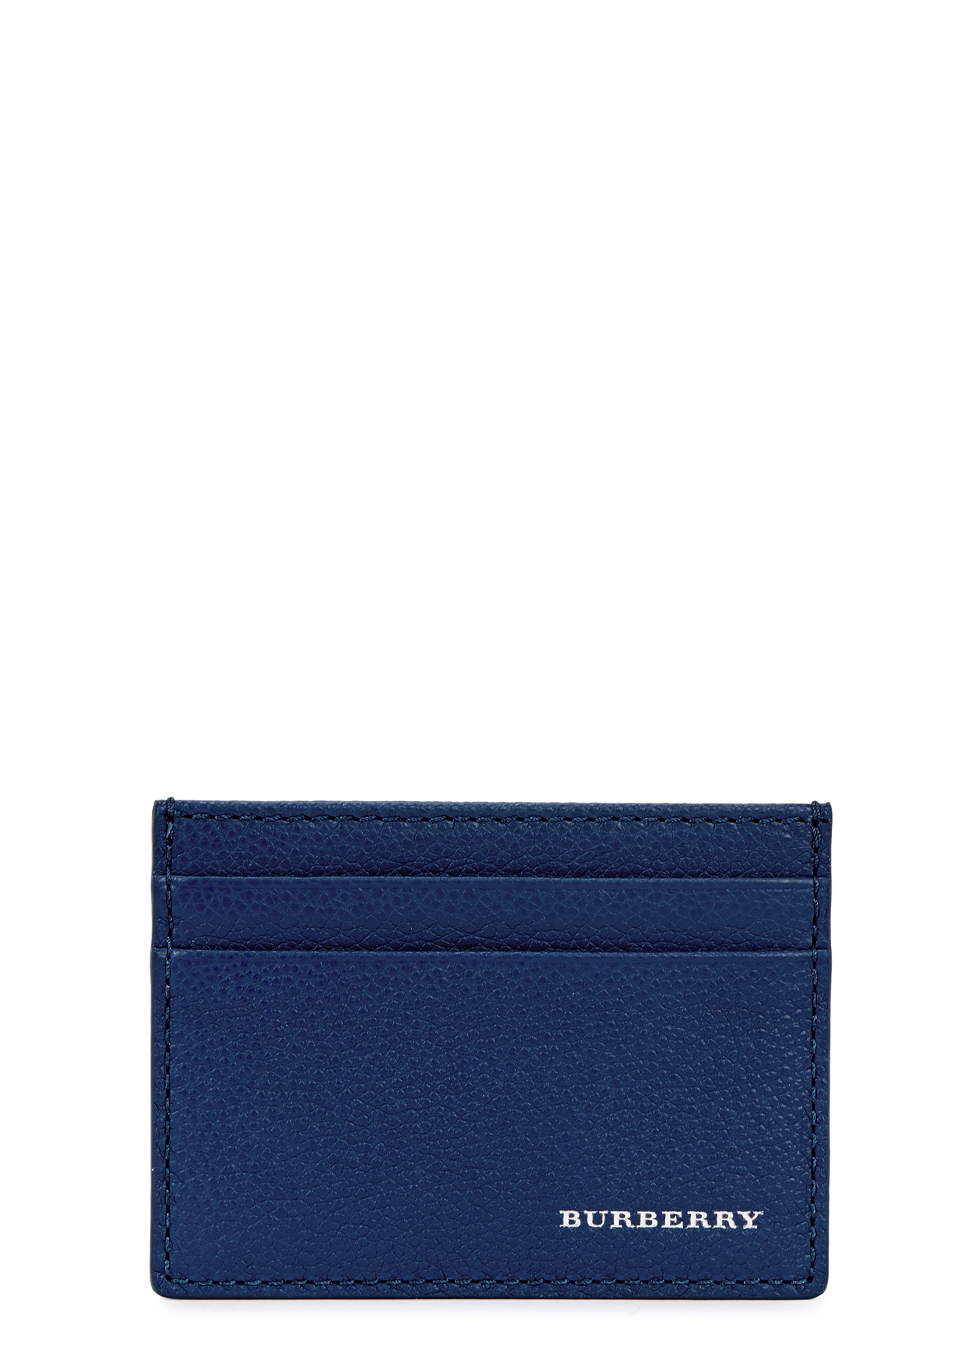 BURBERRY DARK BLUE LEATHER CARD HOLDER